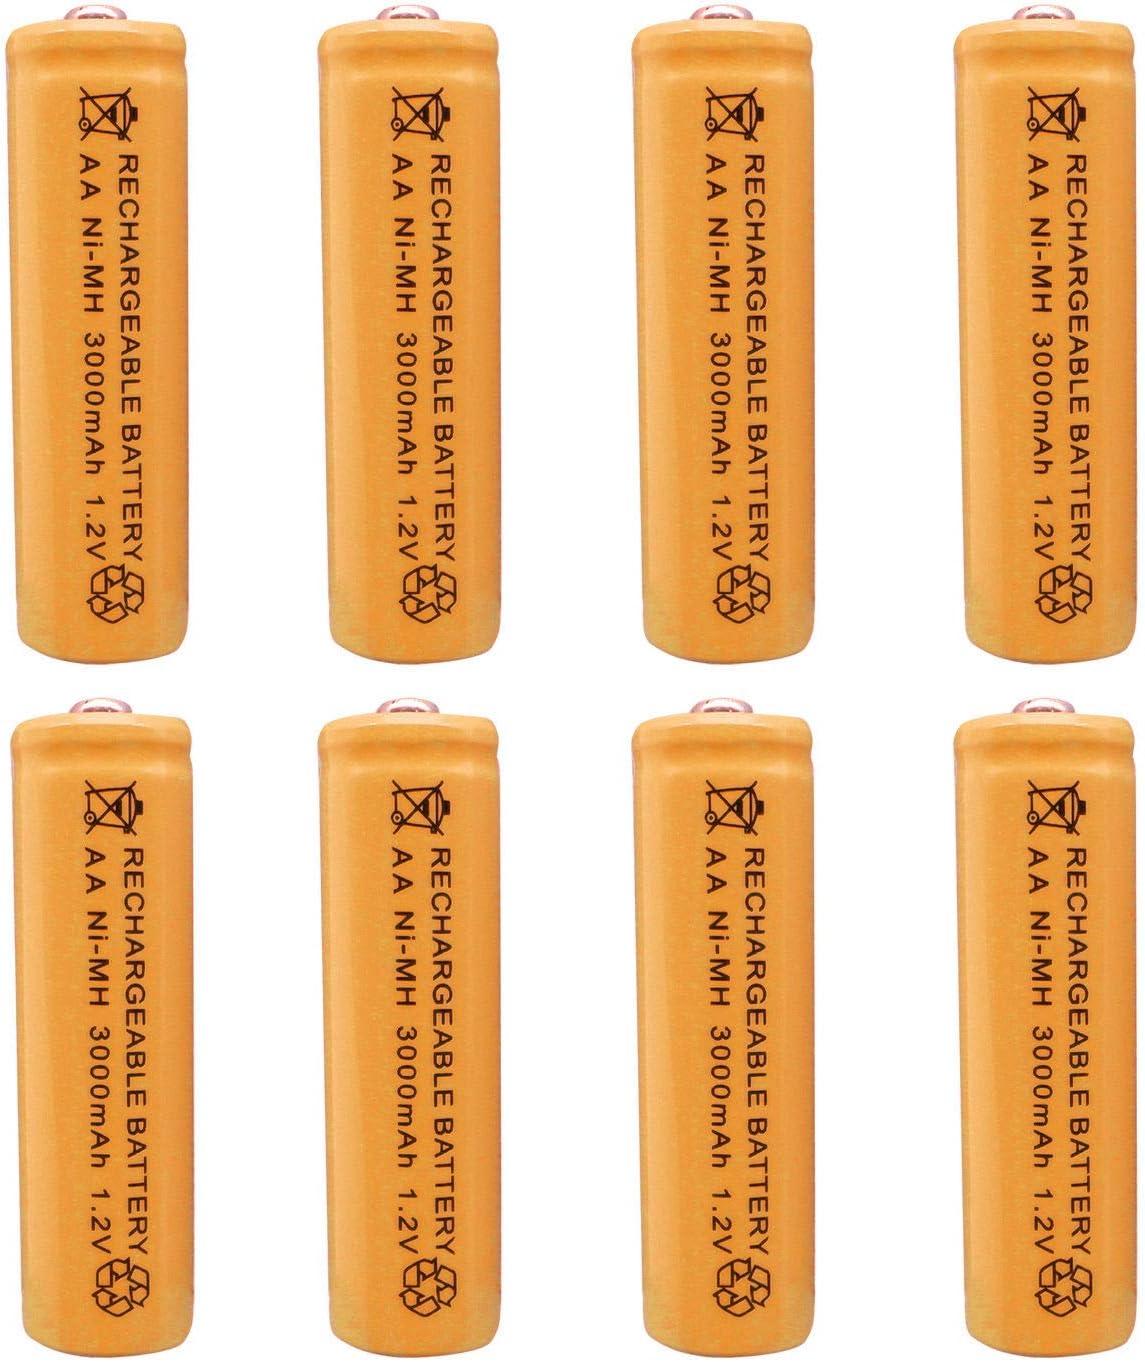 1.2V Ni-MH NiMH Rechargeable Battery Cell Light LED 8pcs AA 2A 3000 Actual 300mAh